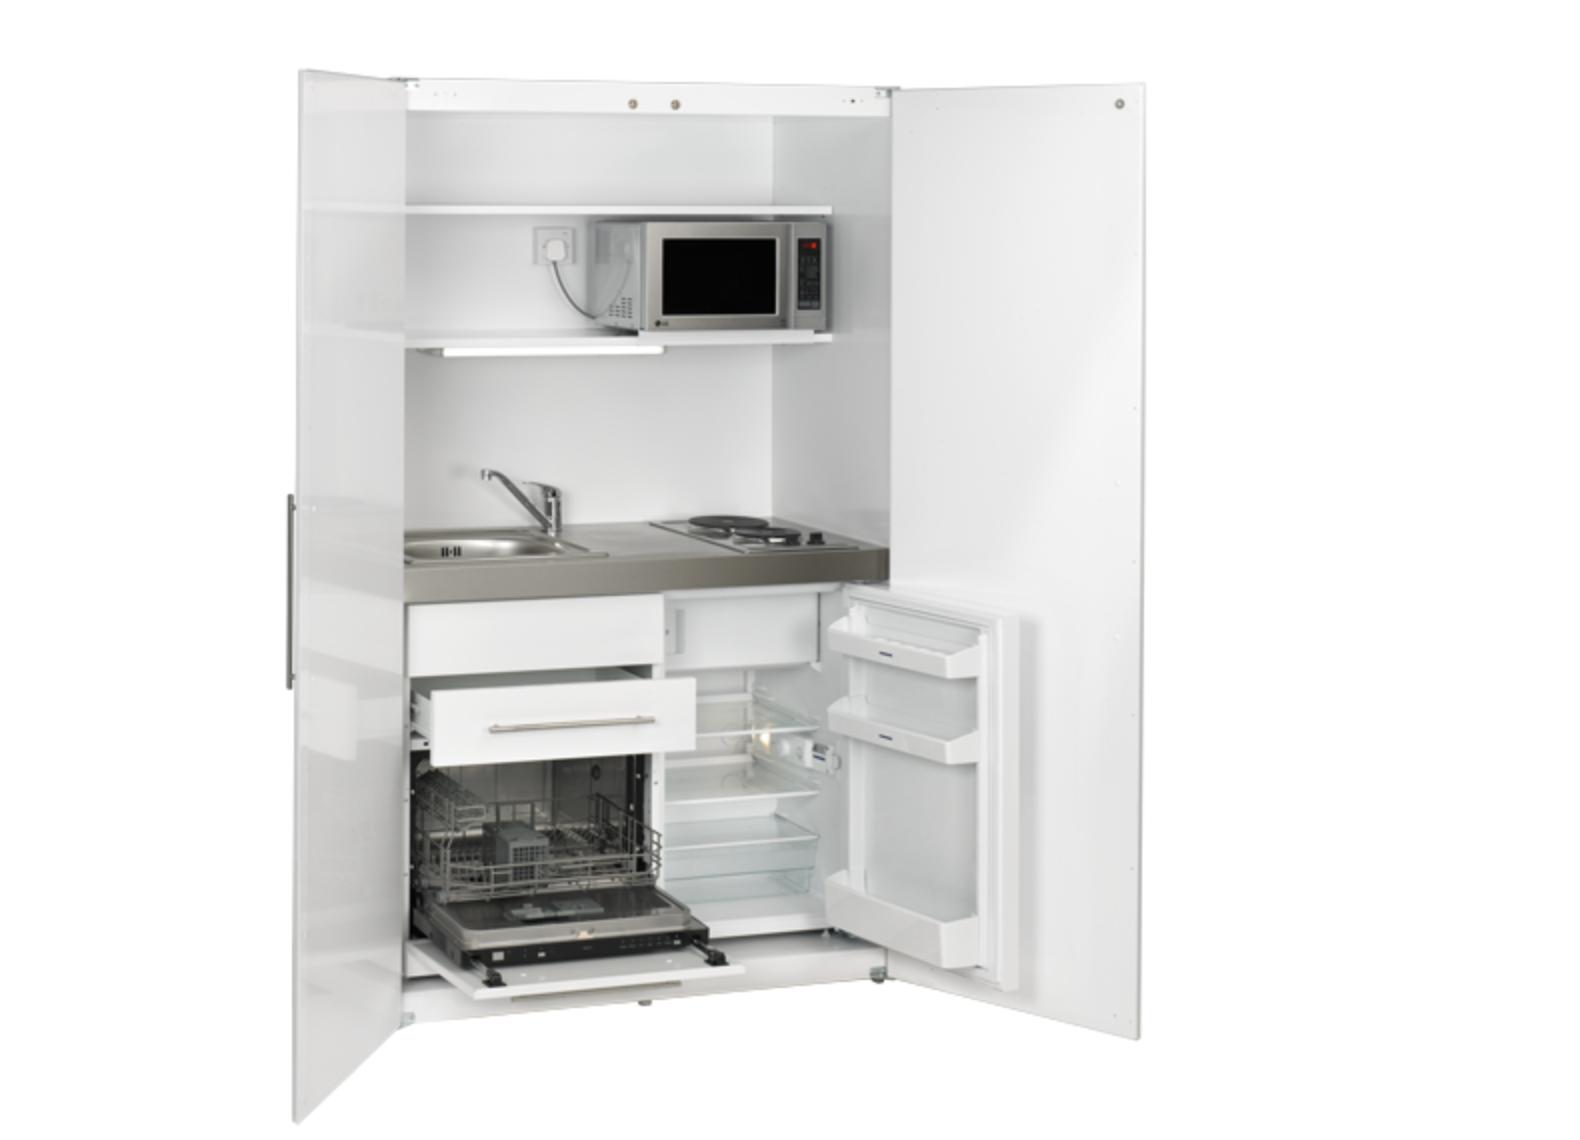 Elfin Kitchens' Kitchen in a Cupboard, From £1424